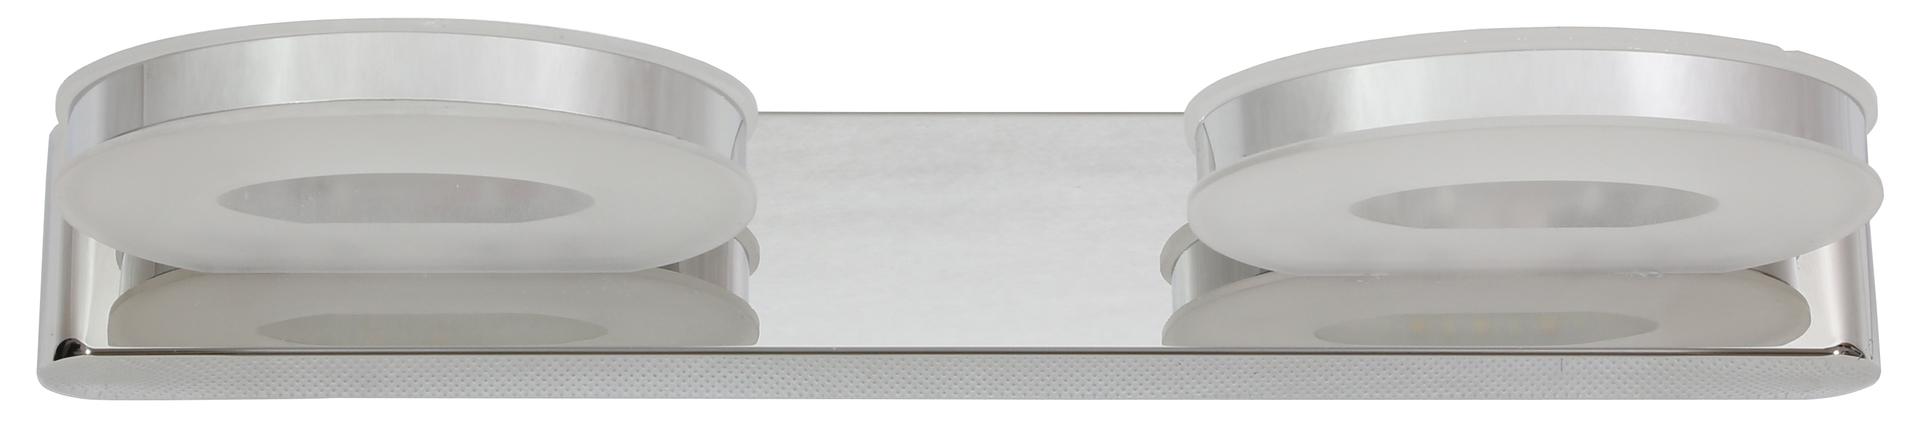 Hana Lampa de perete 36 6W Led Chrome